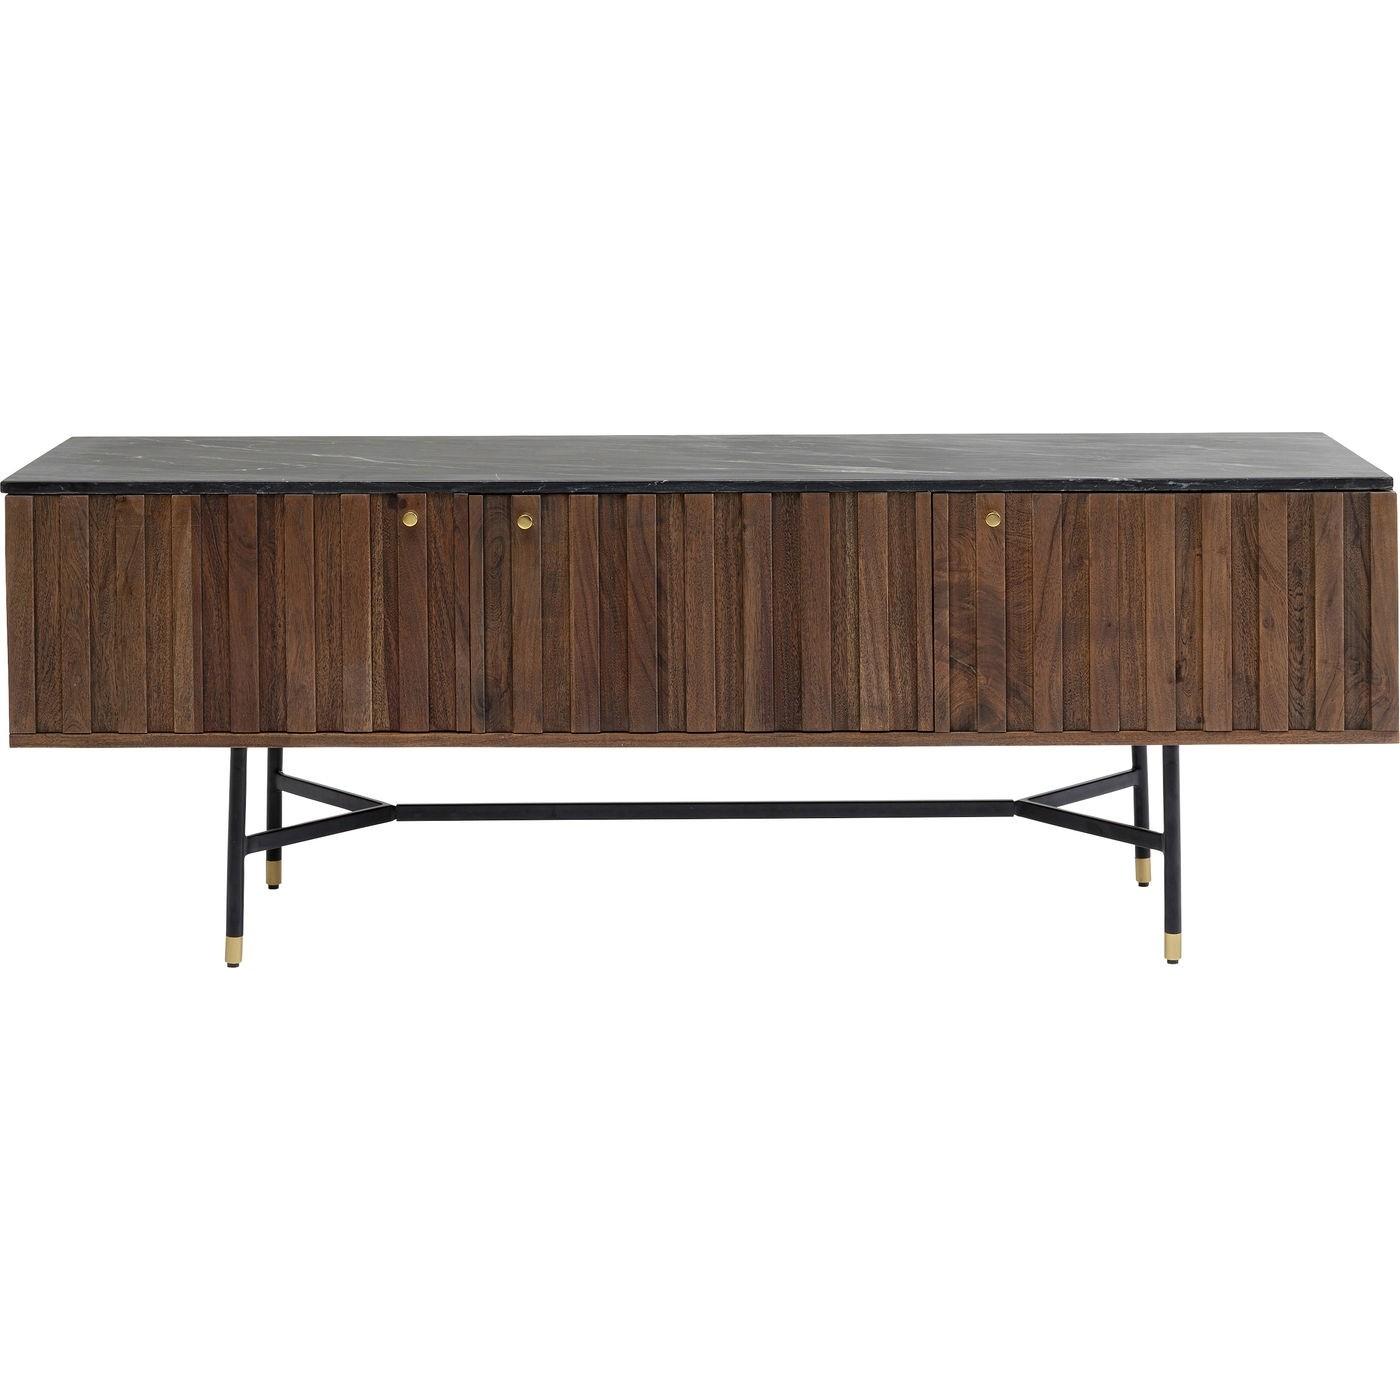 KARE DESIGN Apiano TV-bord, m 3 låger - brun akacietræfiner, sort marmor og stål (150x40)